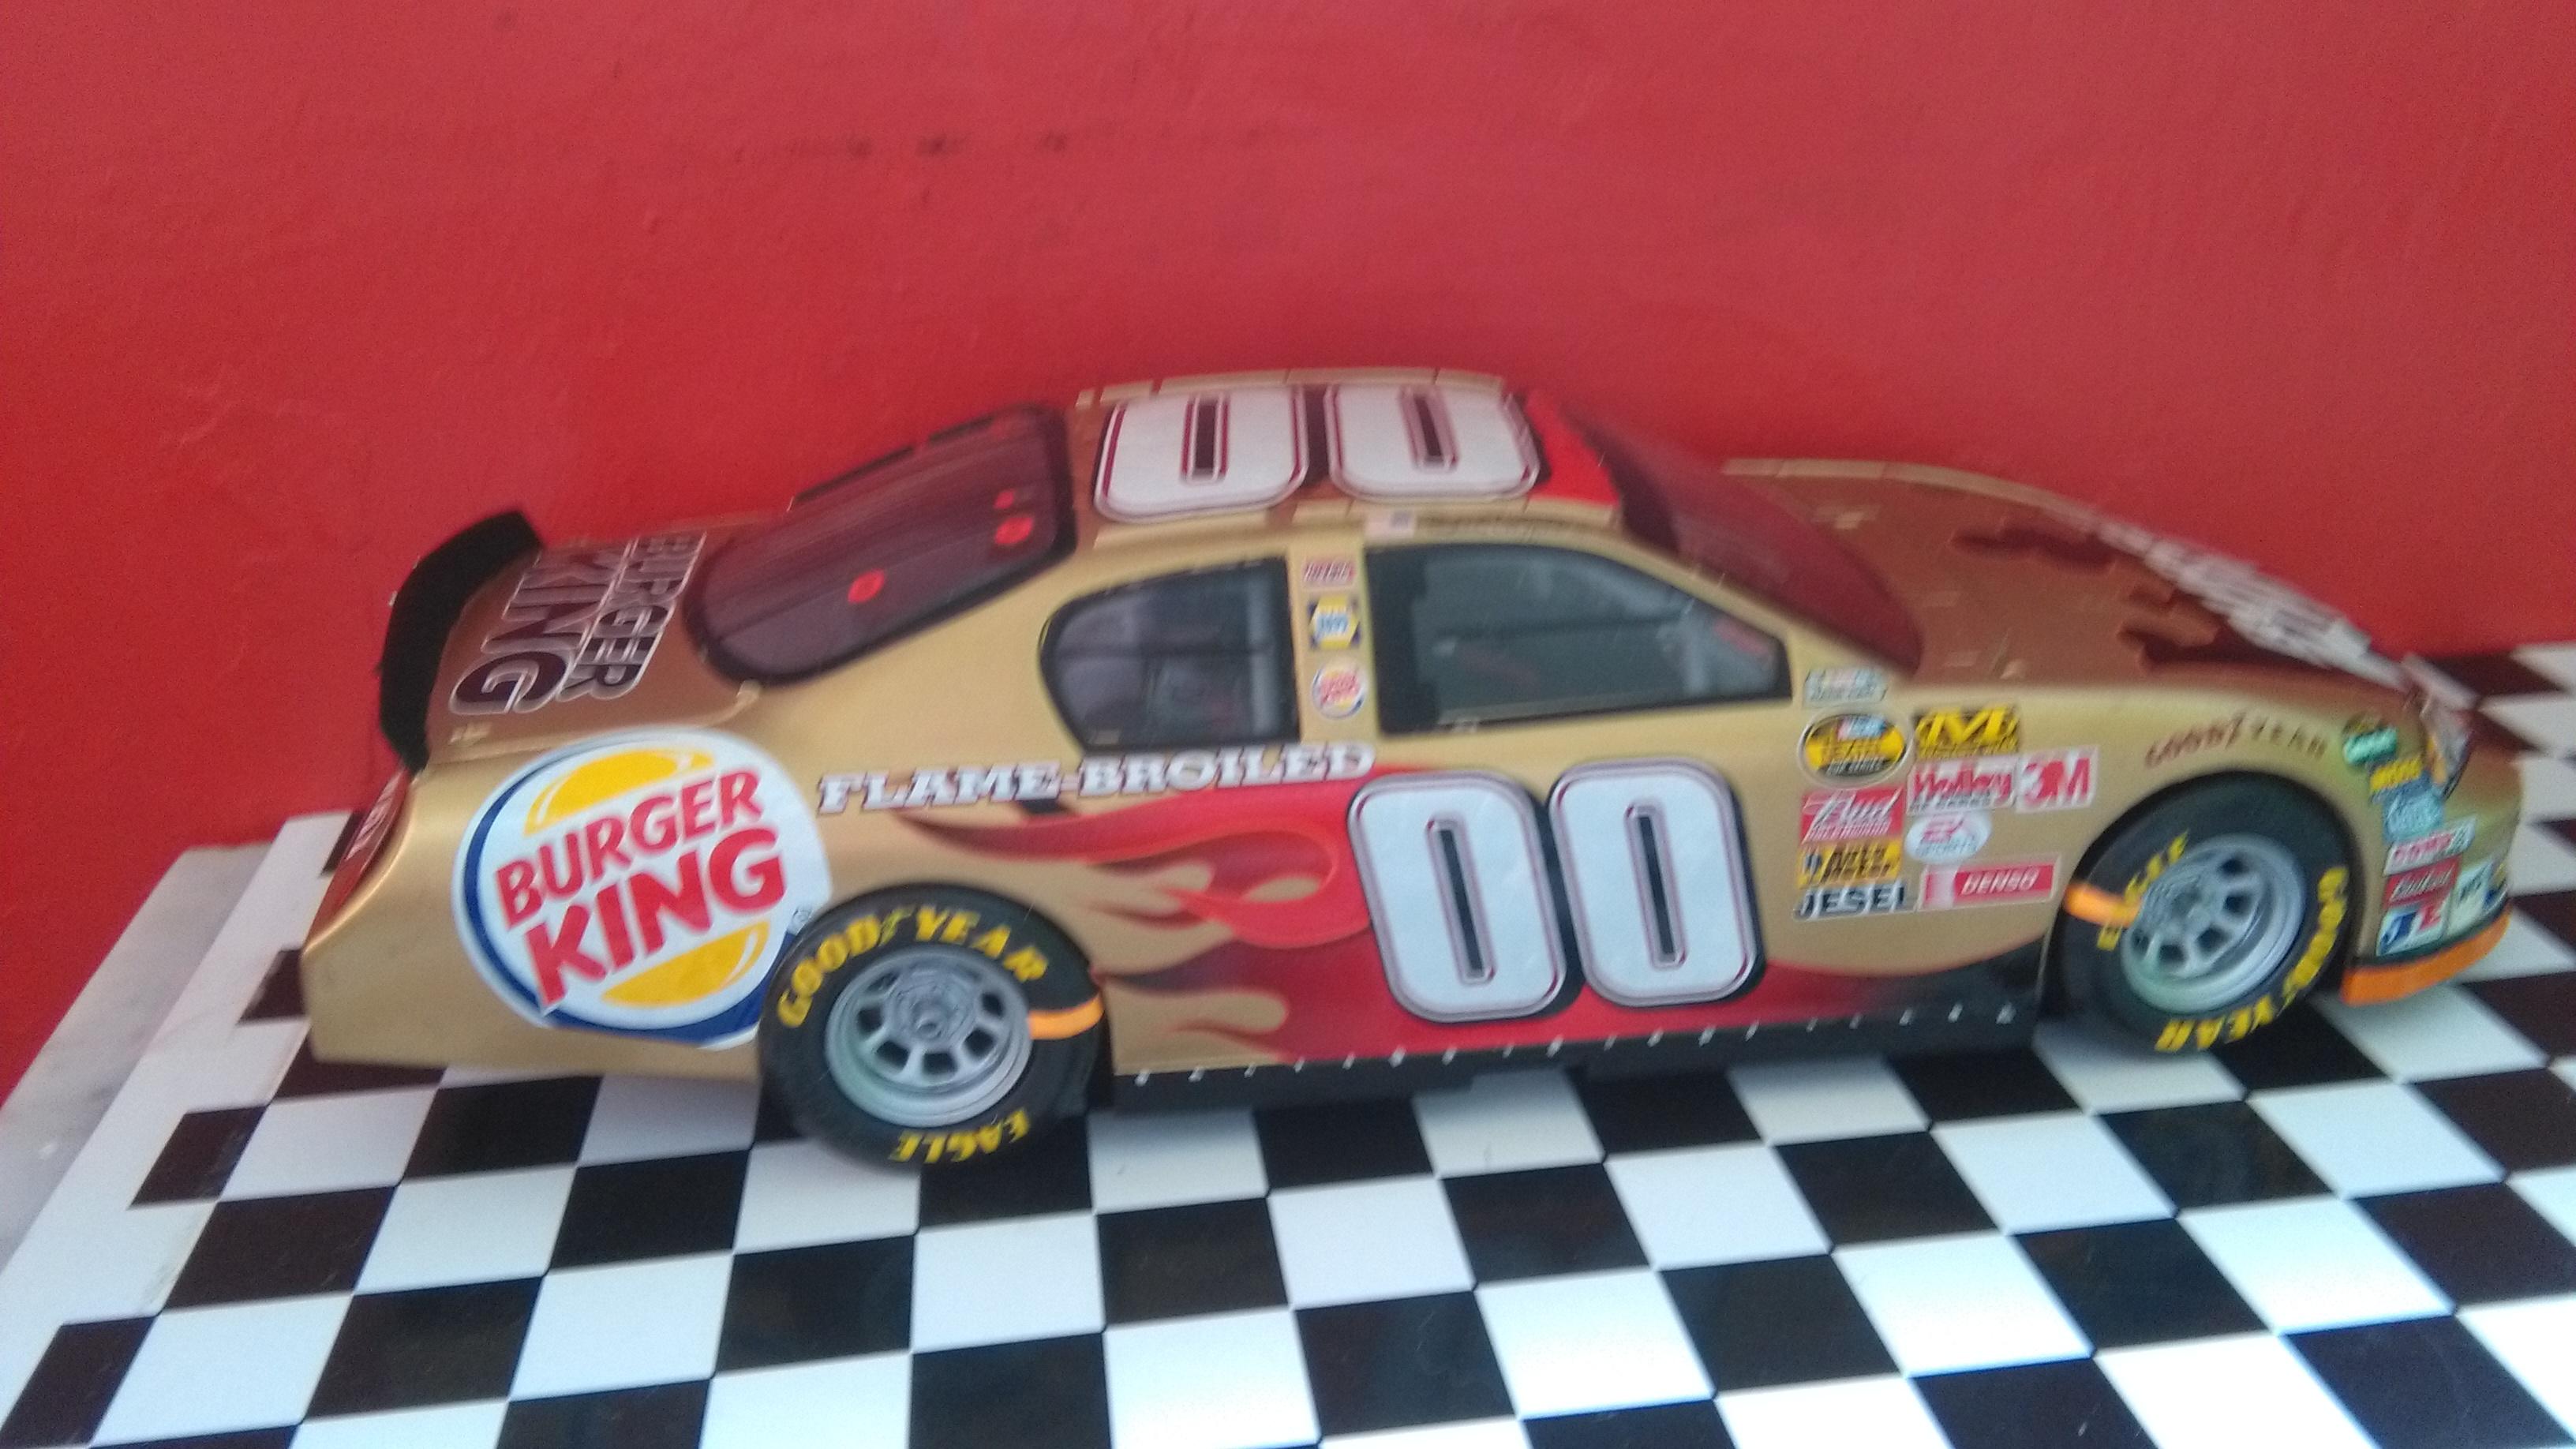 Chevy Monte-Carlo 2006 #00 Bill Elliott Burger King 715442IMG20170513134332